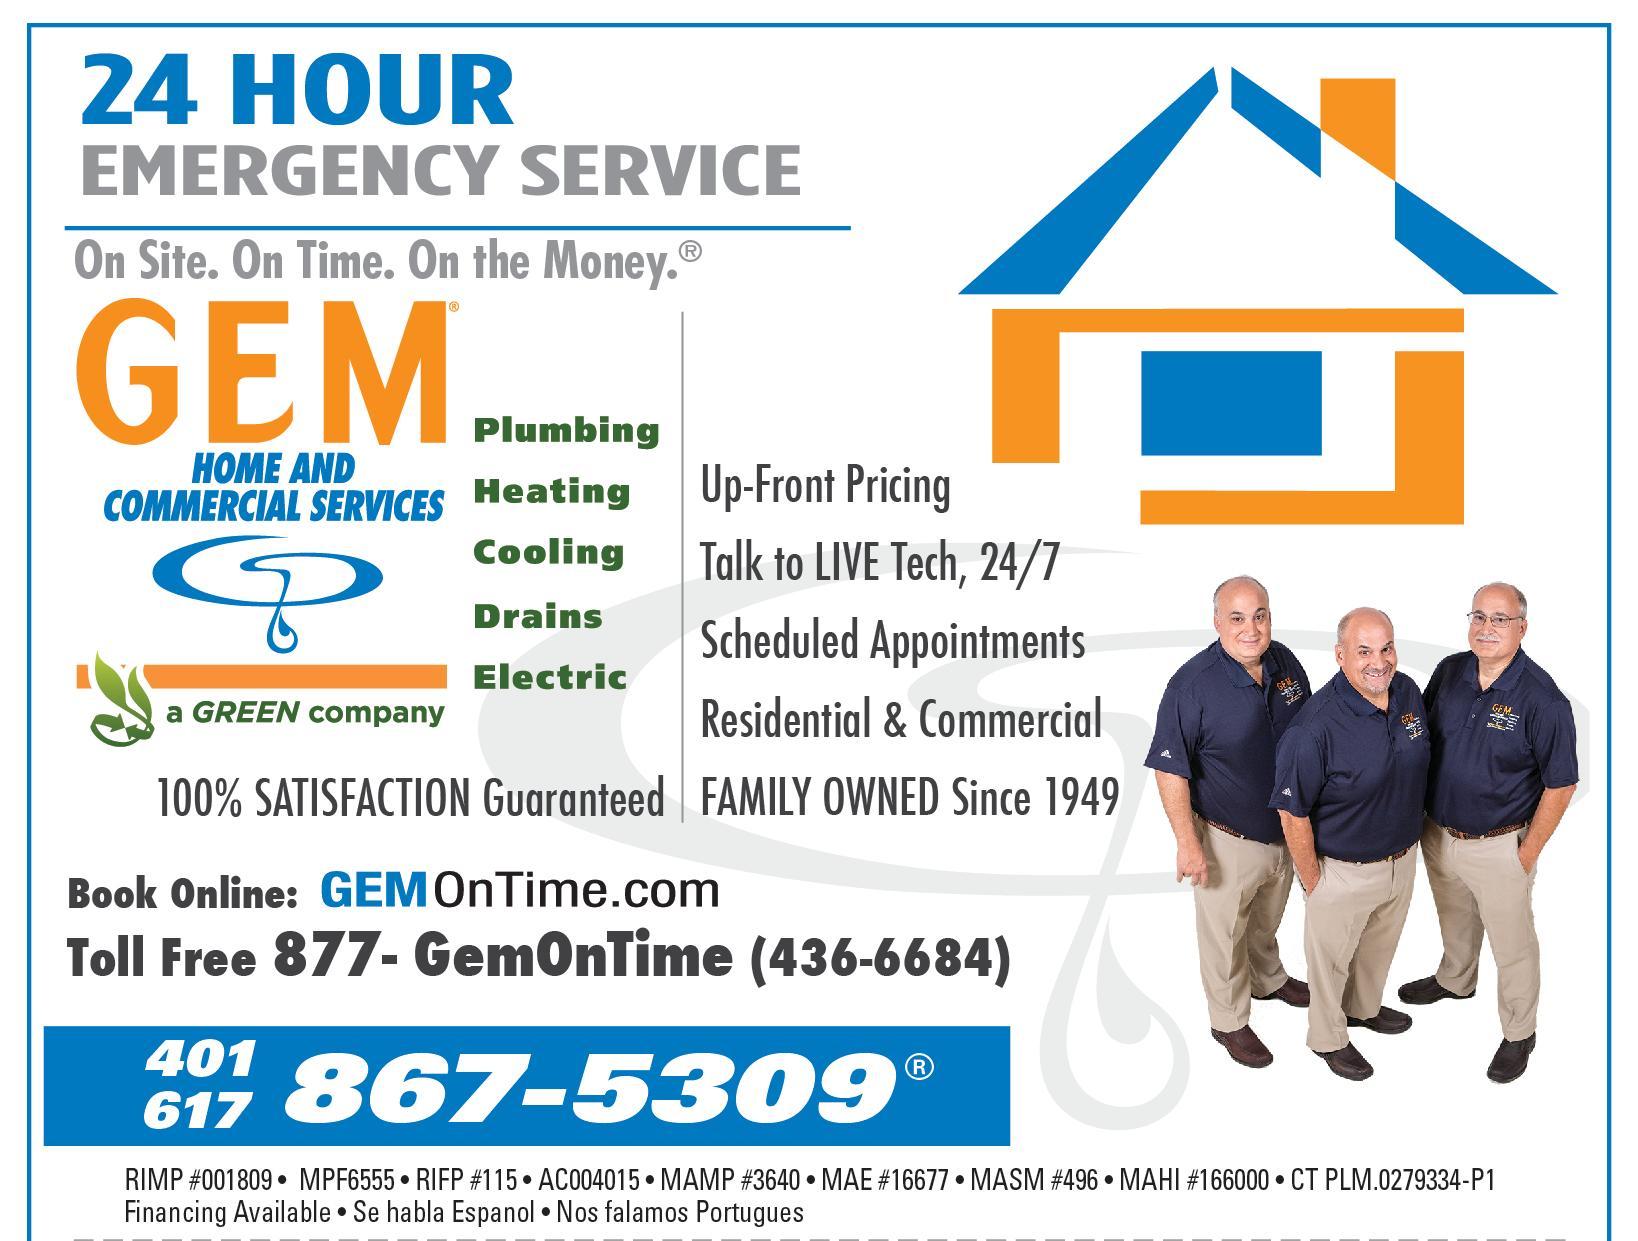 Gem Plumbing & Heating Services, Inc. image 3